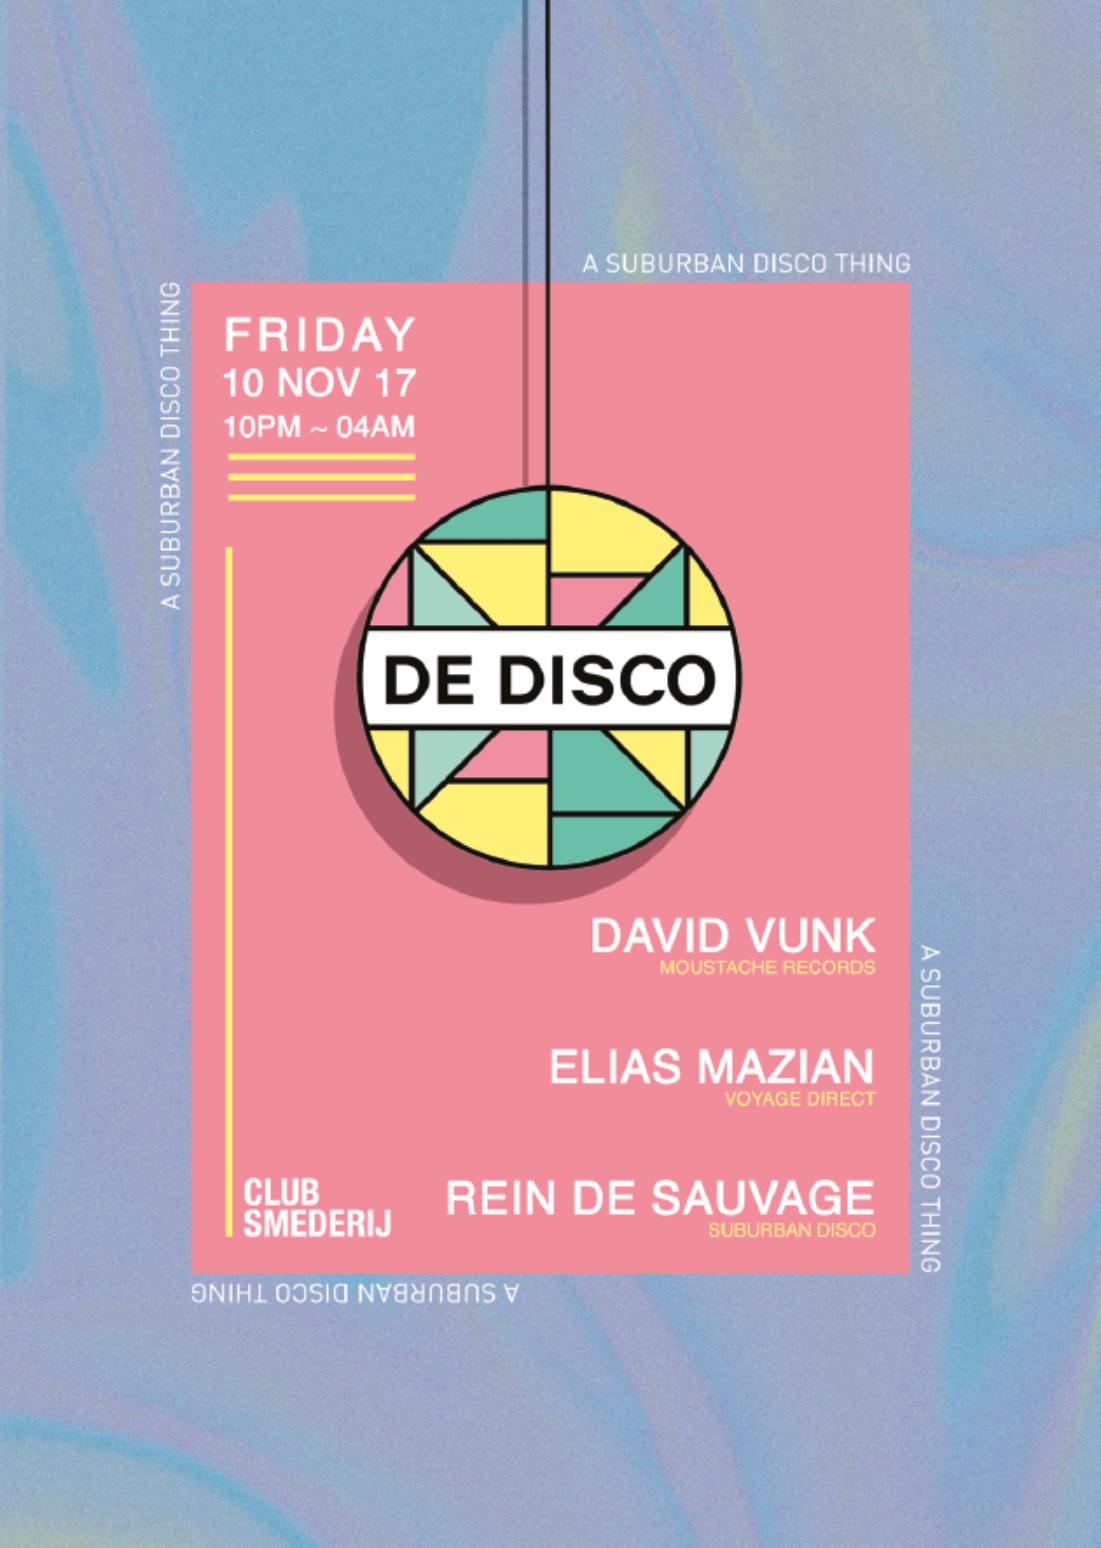 De Disco w/ David Vunk + Elias Mazian